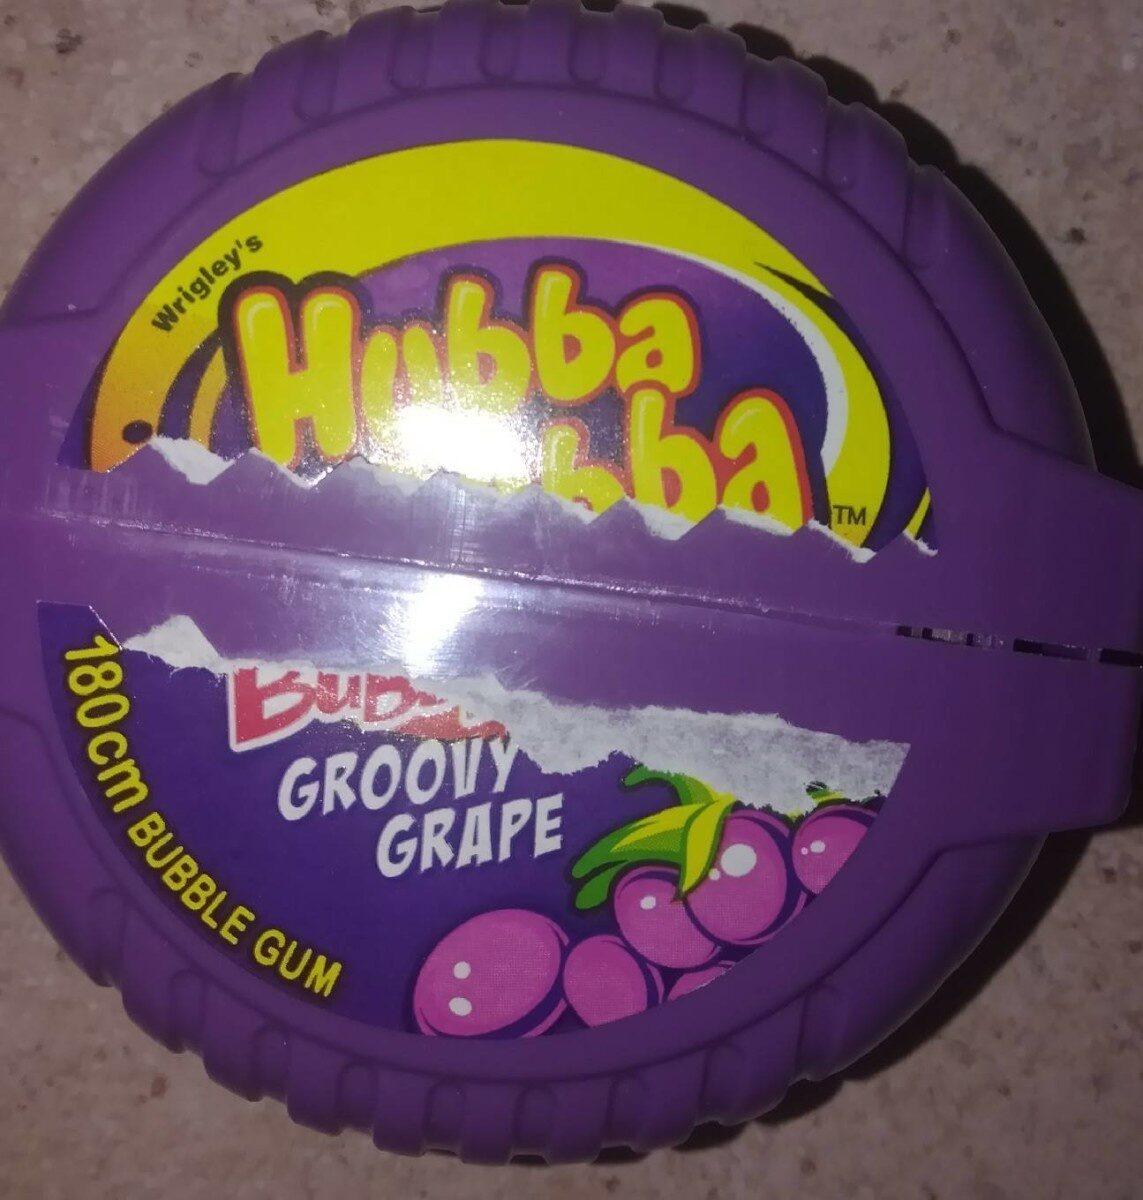 Hubba bubba - Product - en